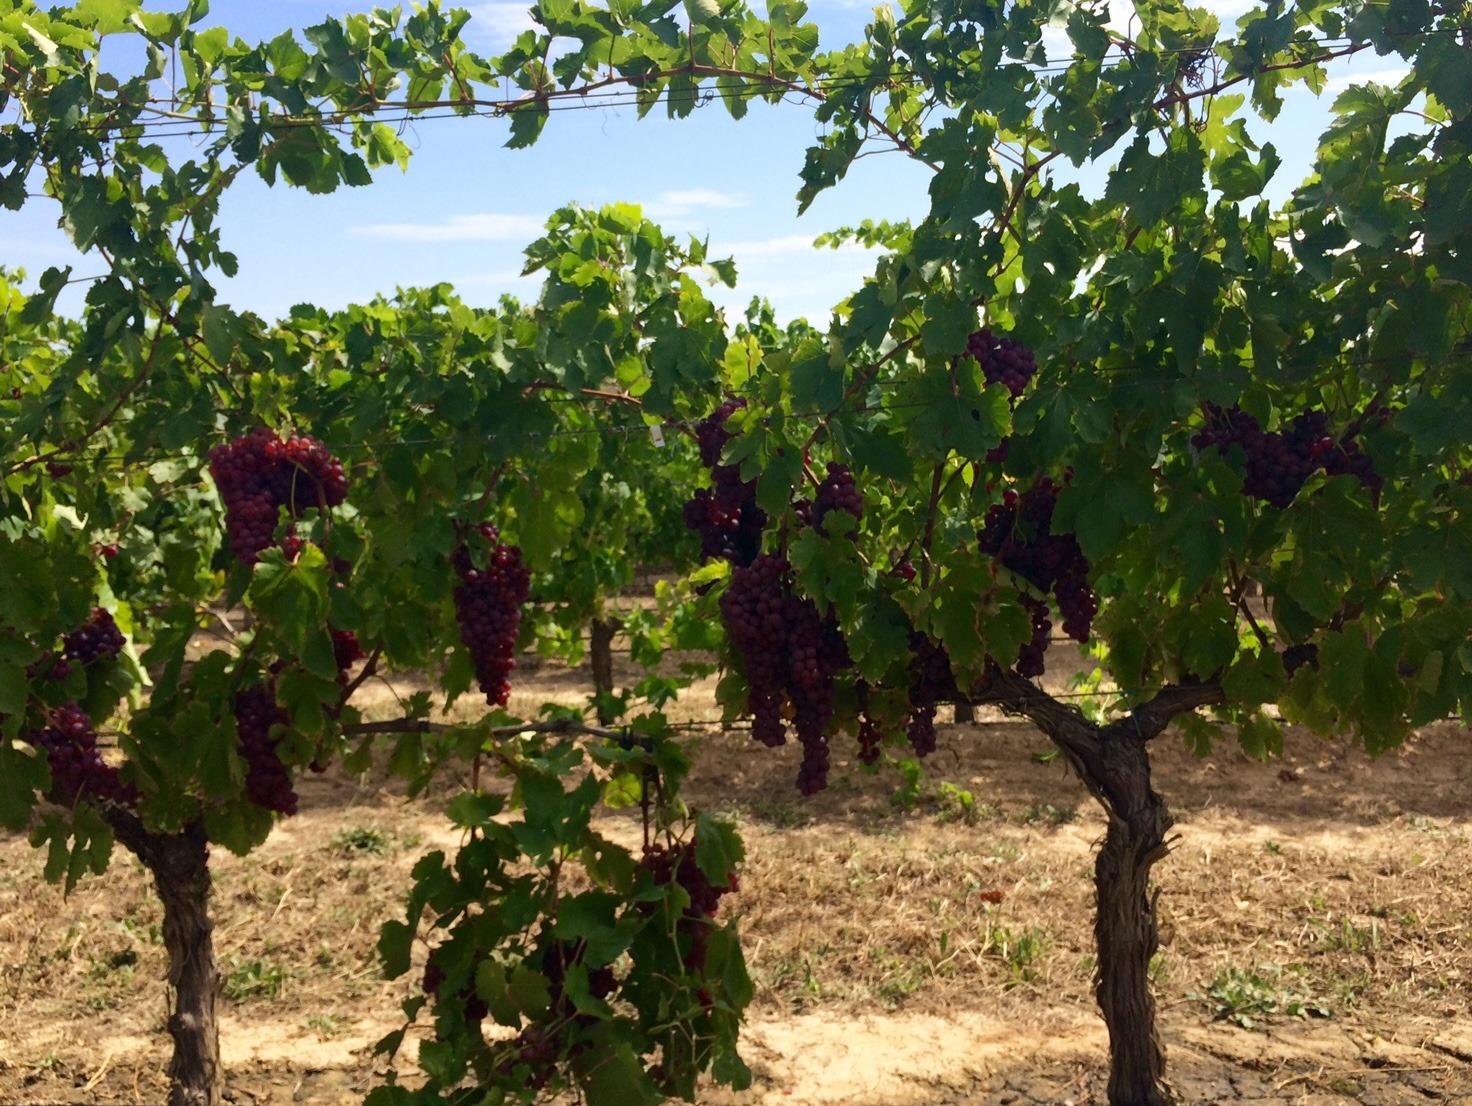 Finca de viña perteneciente a Viveros Villanueva.